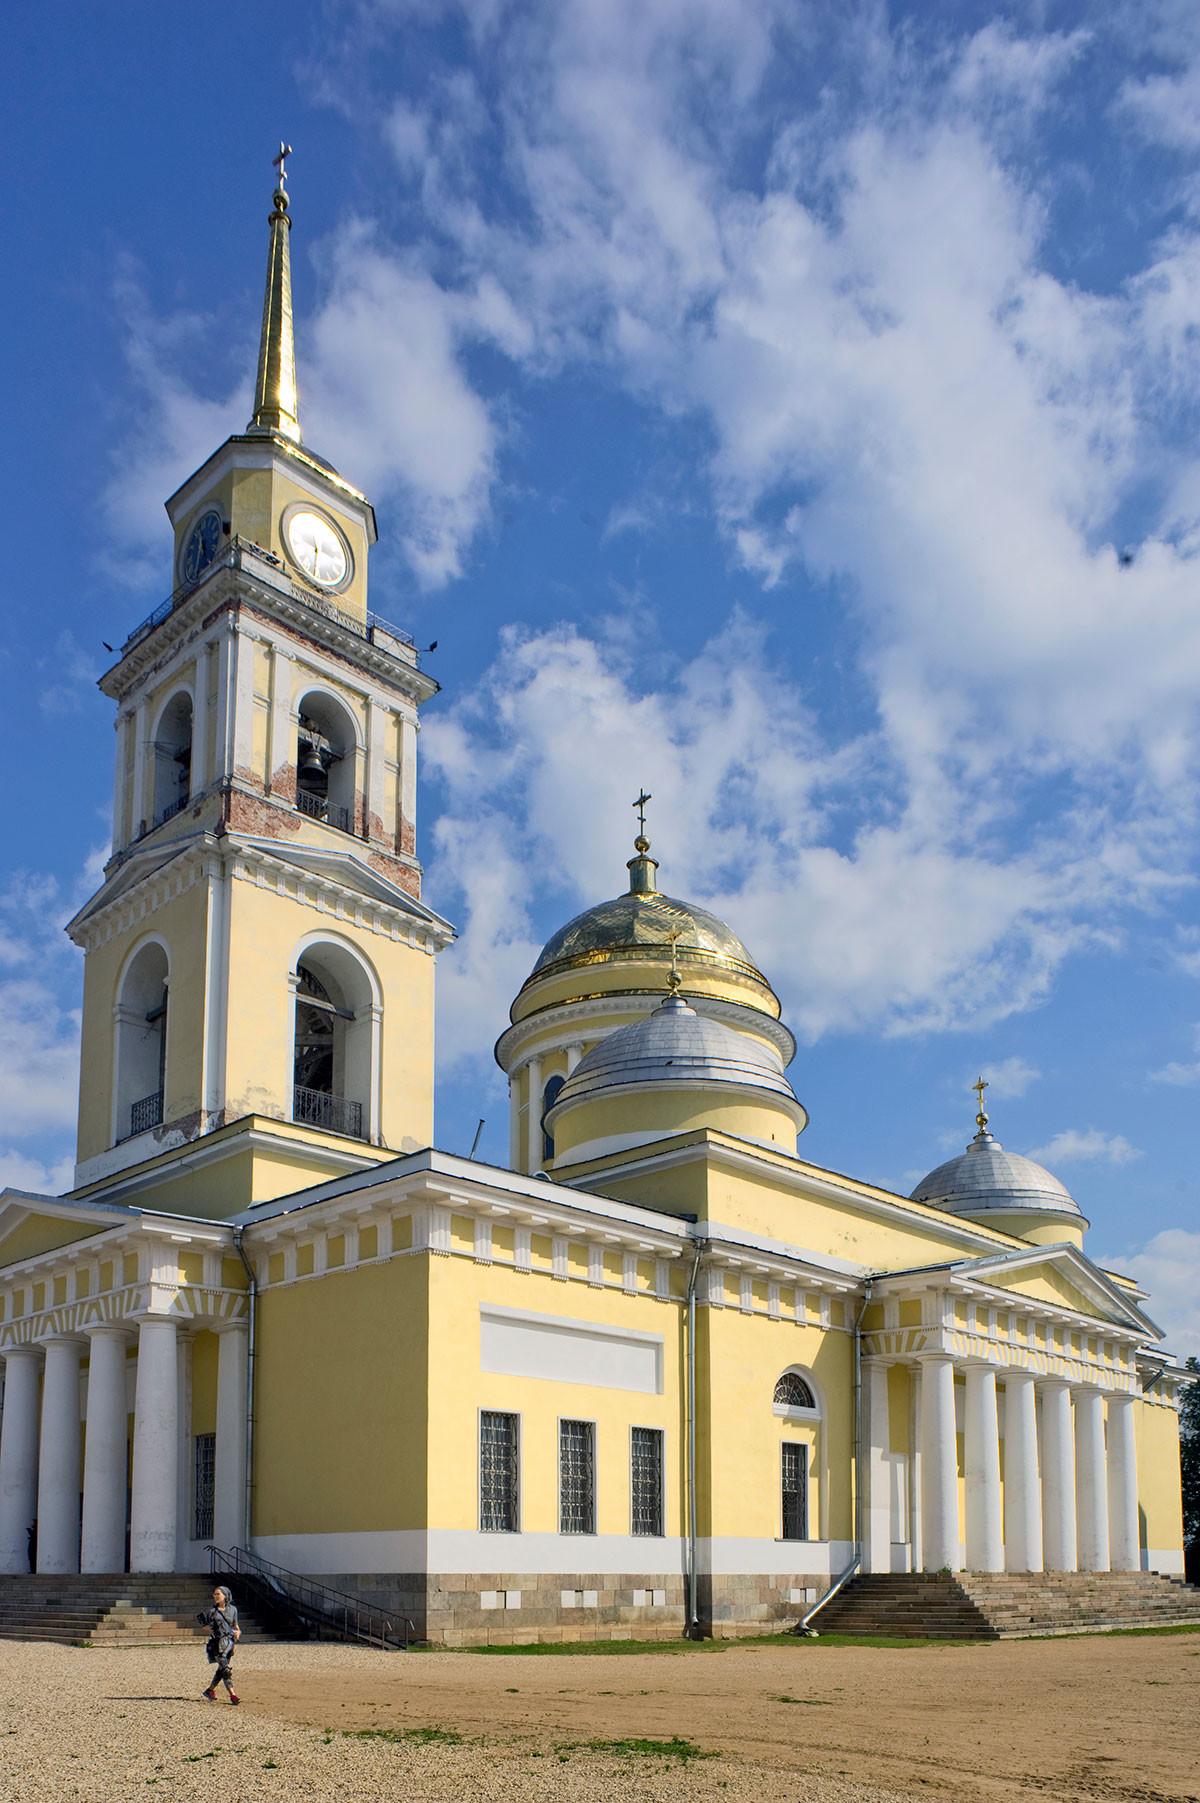 Богоявленска катедрала и камбанария, югозападен изглед. 23 август, 2016 г.